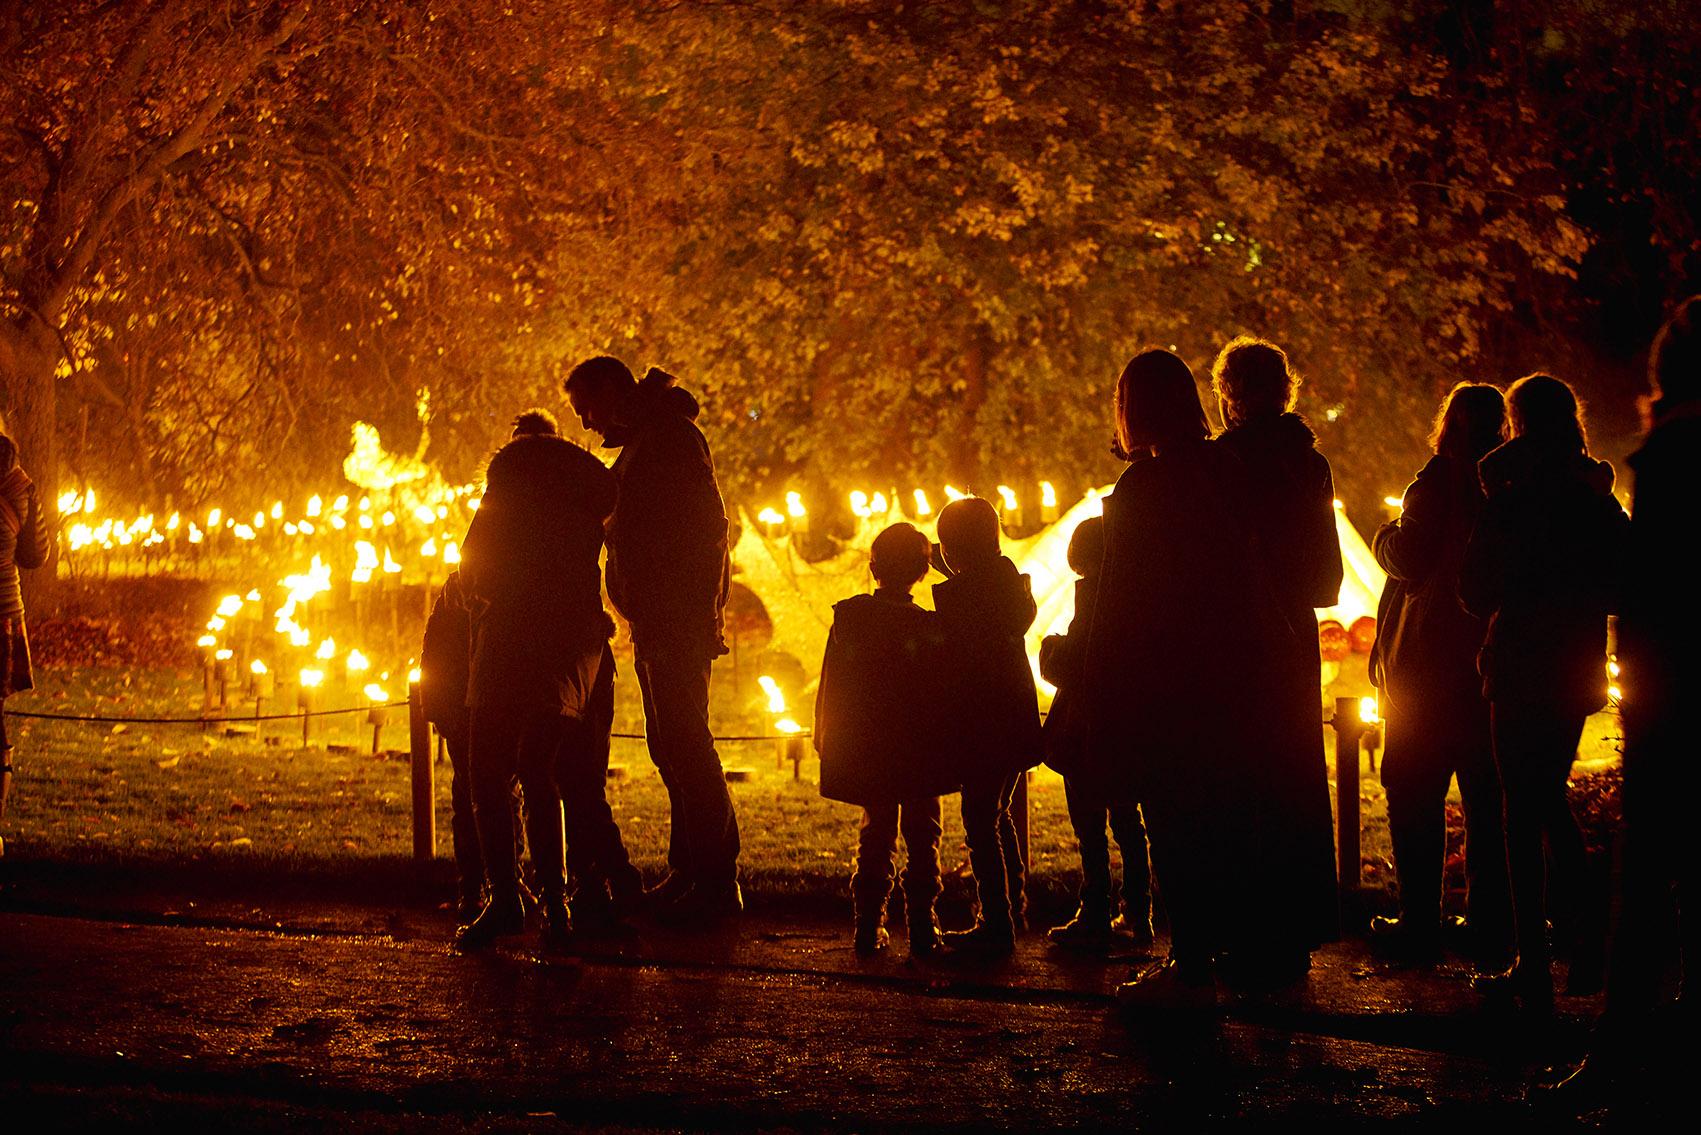 Fire Garden Illumination at Christmas at Belton.jpg